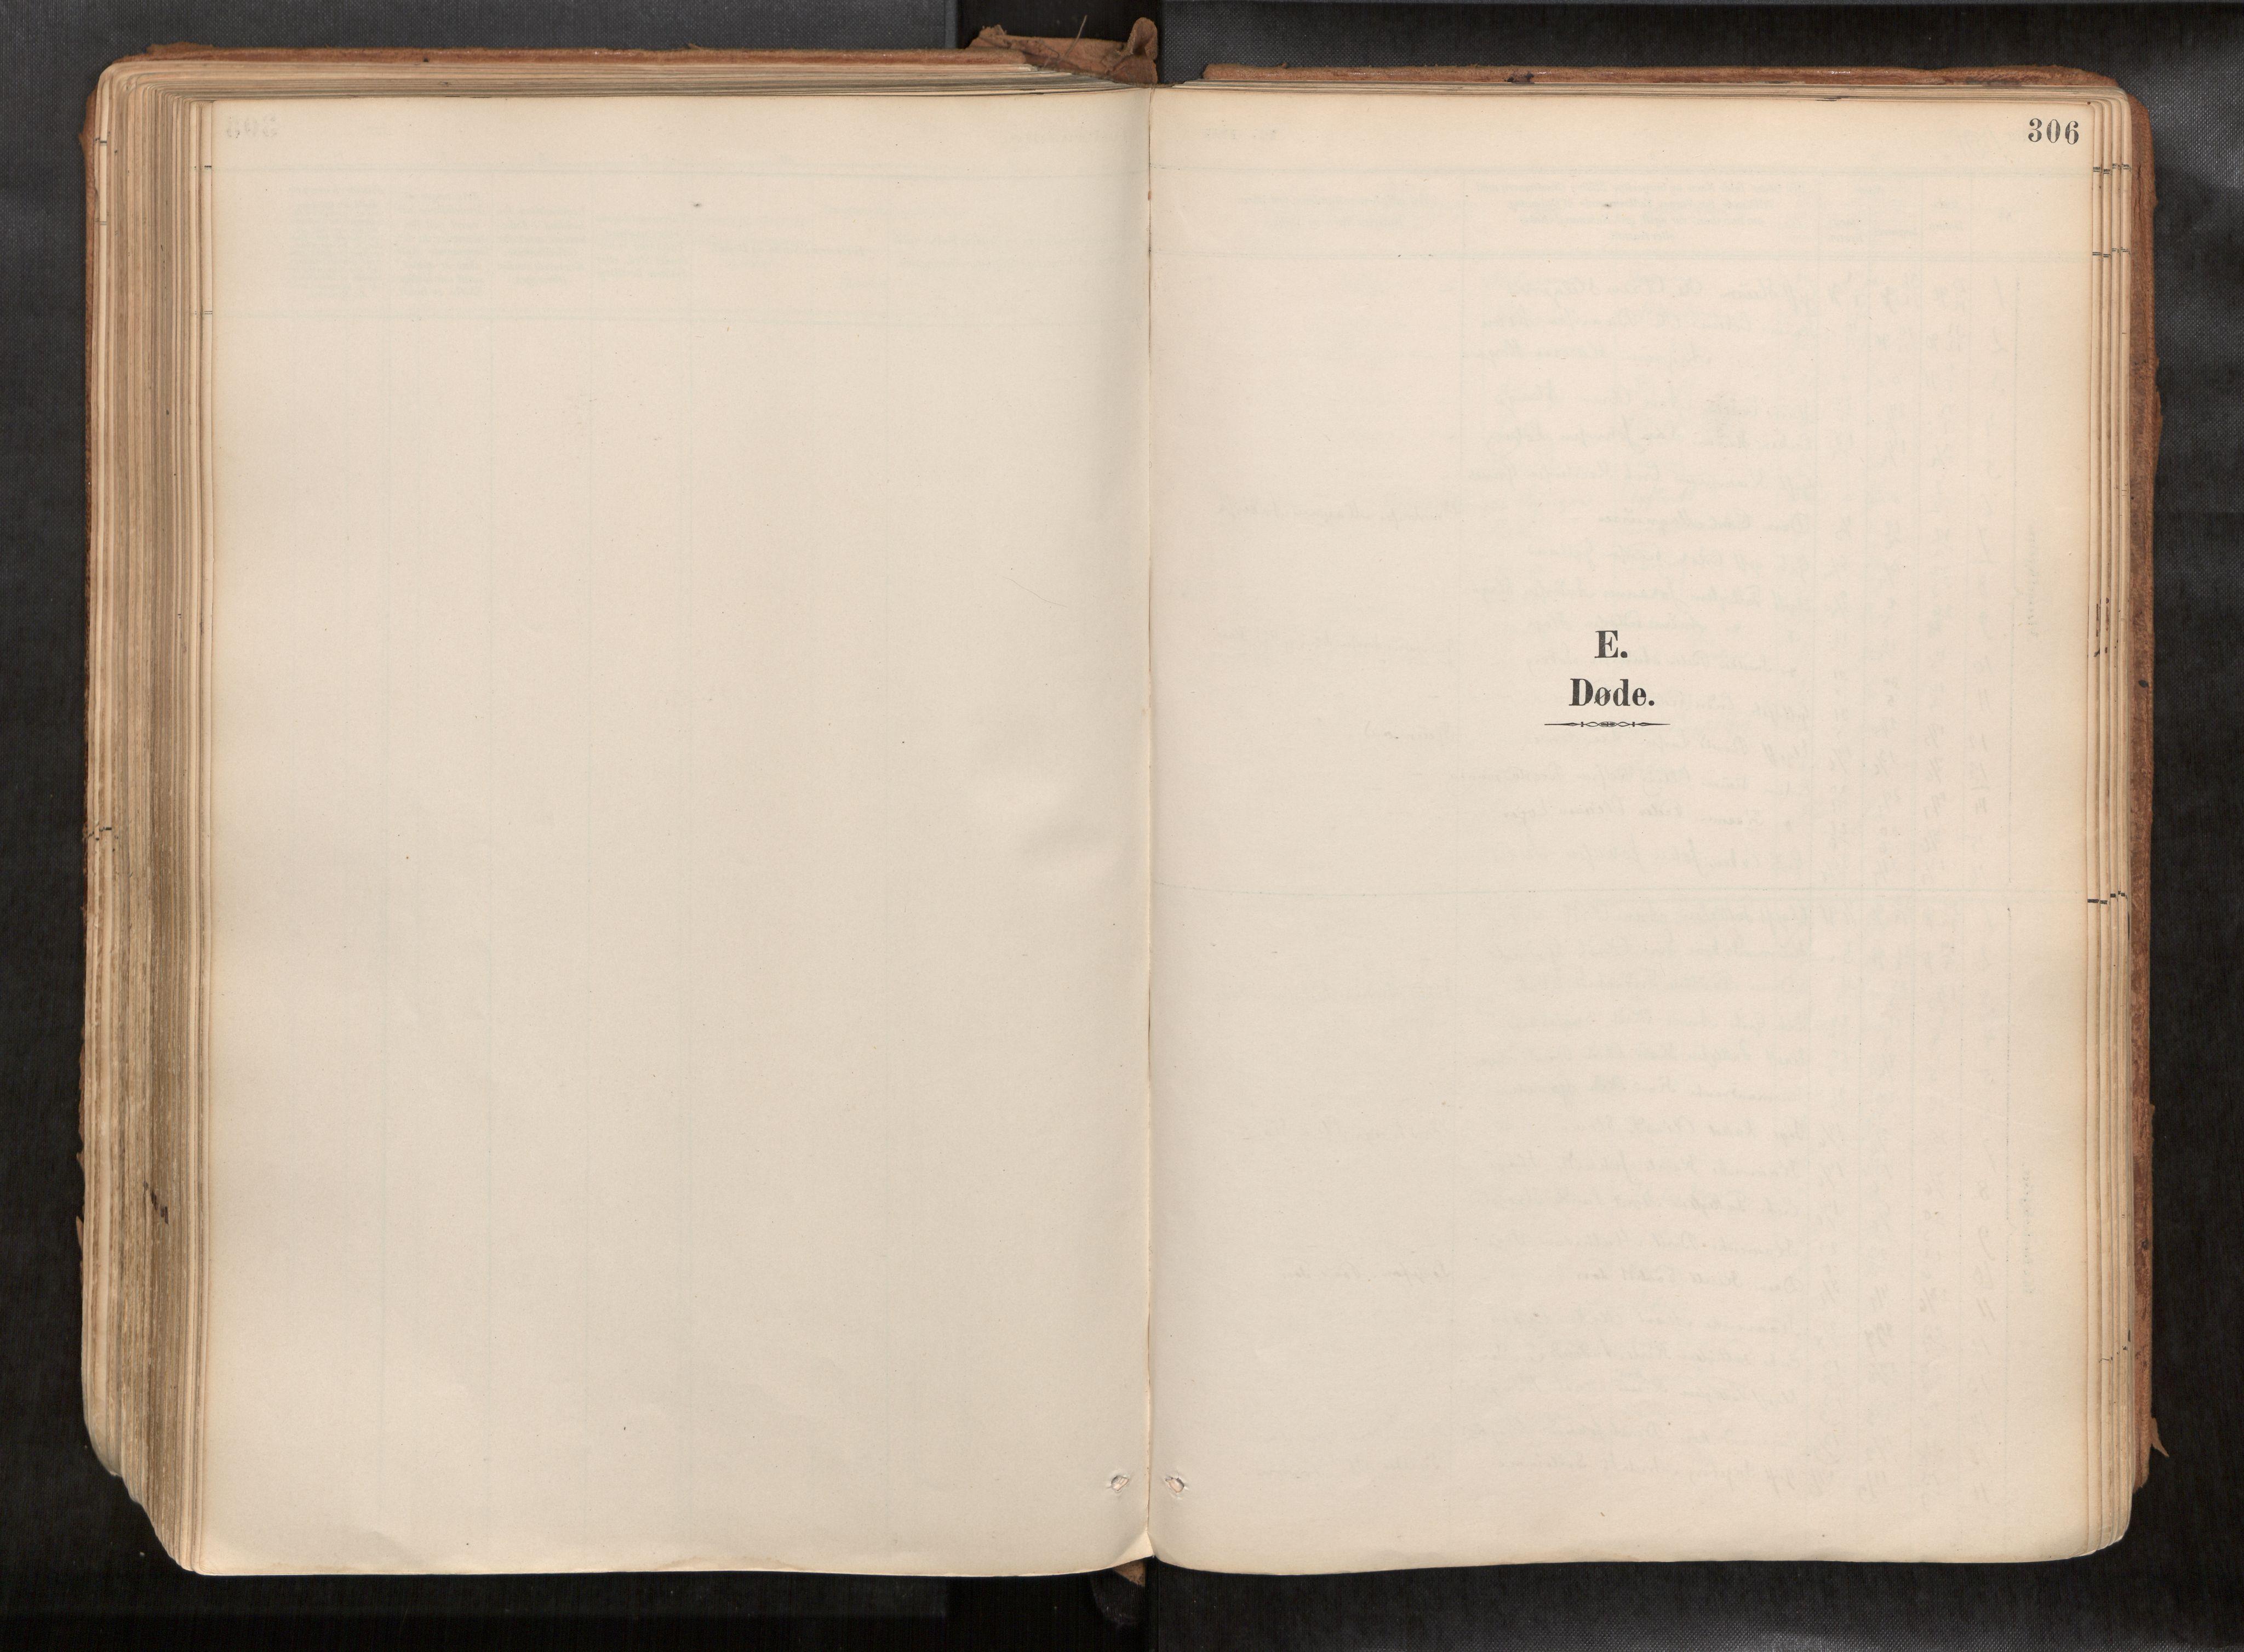 SAT, Ministerialprotokoller, klokkerbøker og fødselsregistre - Sør-Trøndelag, 692/L1105b: Parish register (official) no. 692A06, 1891-1934, p. 306